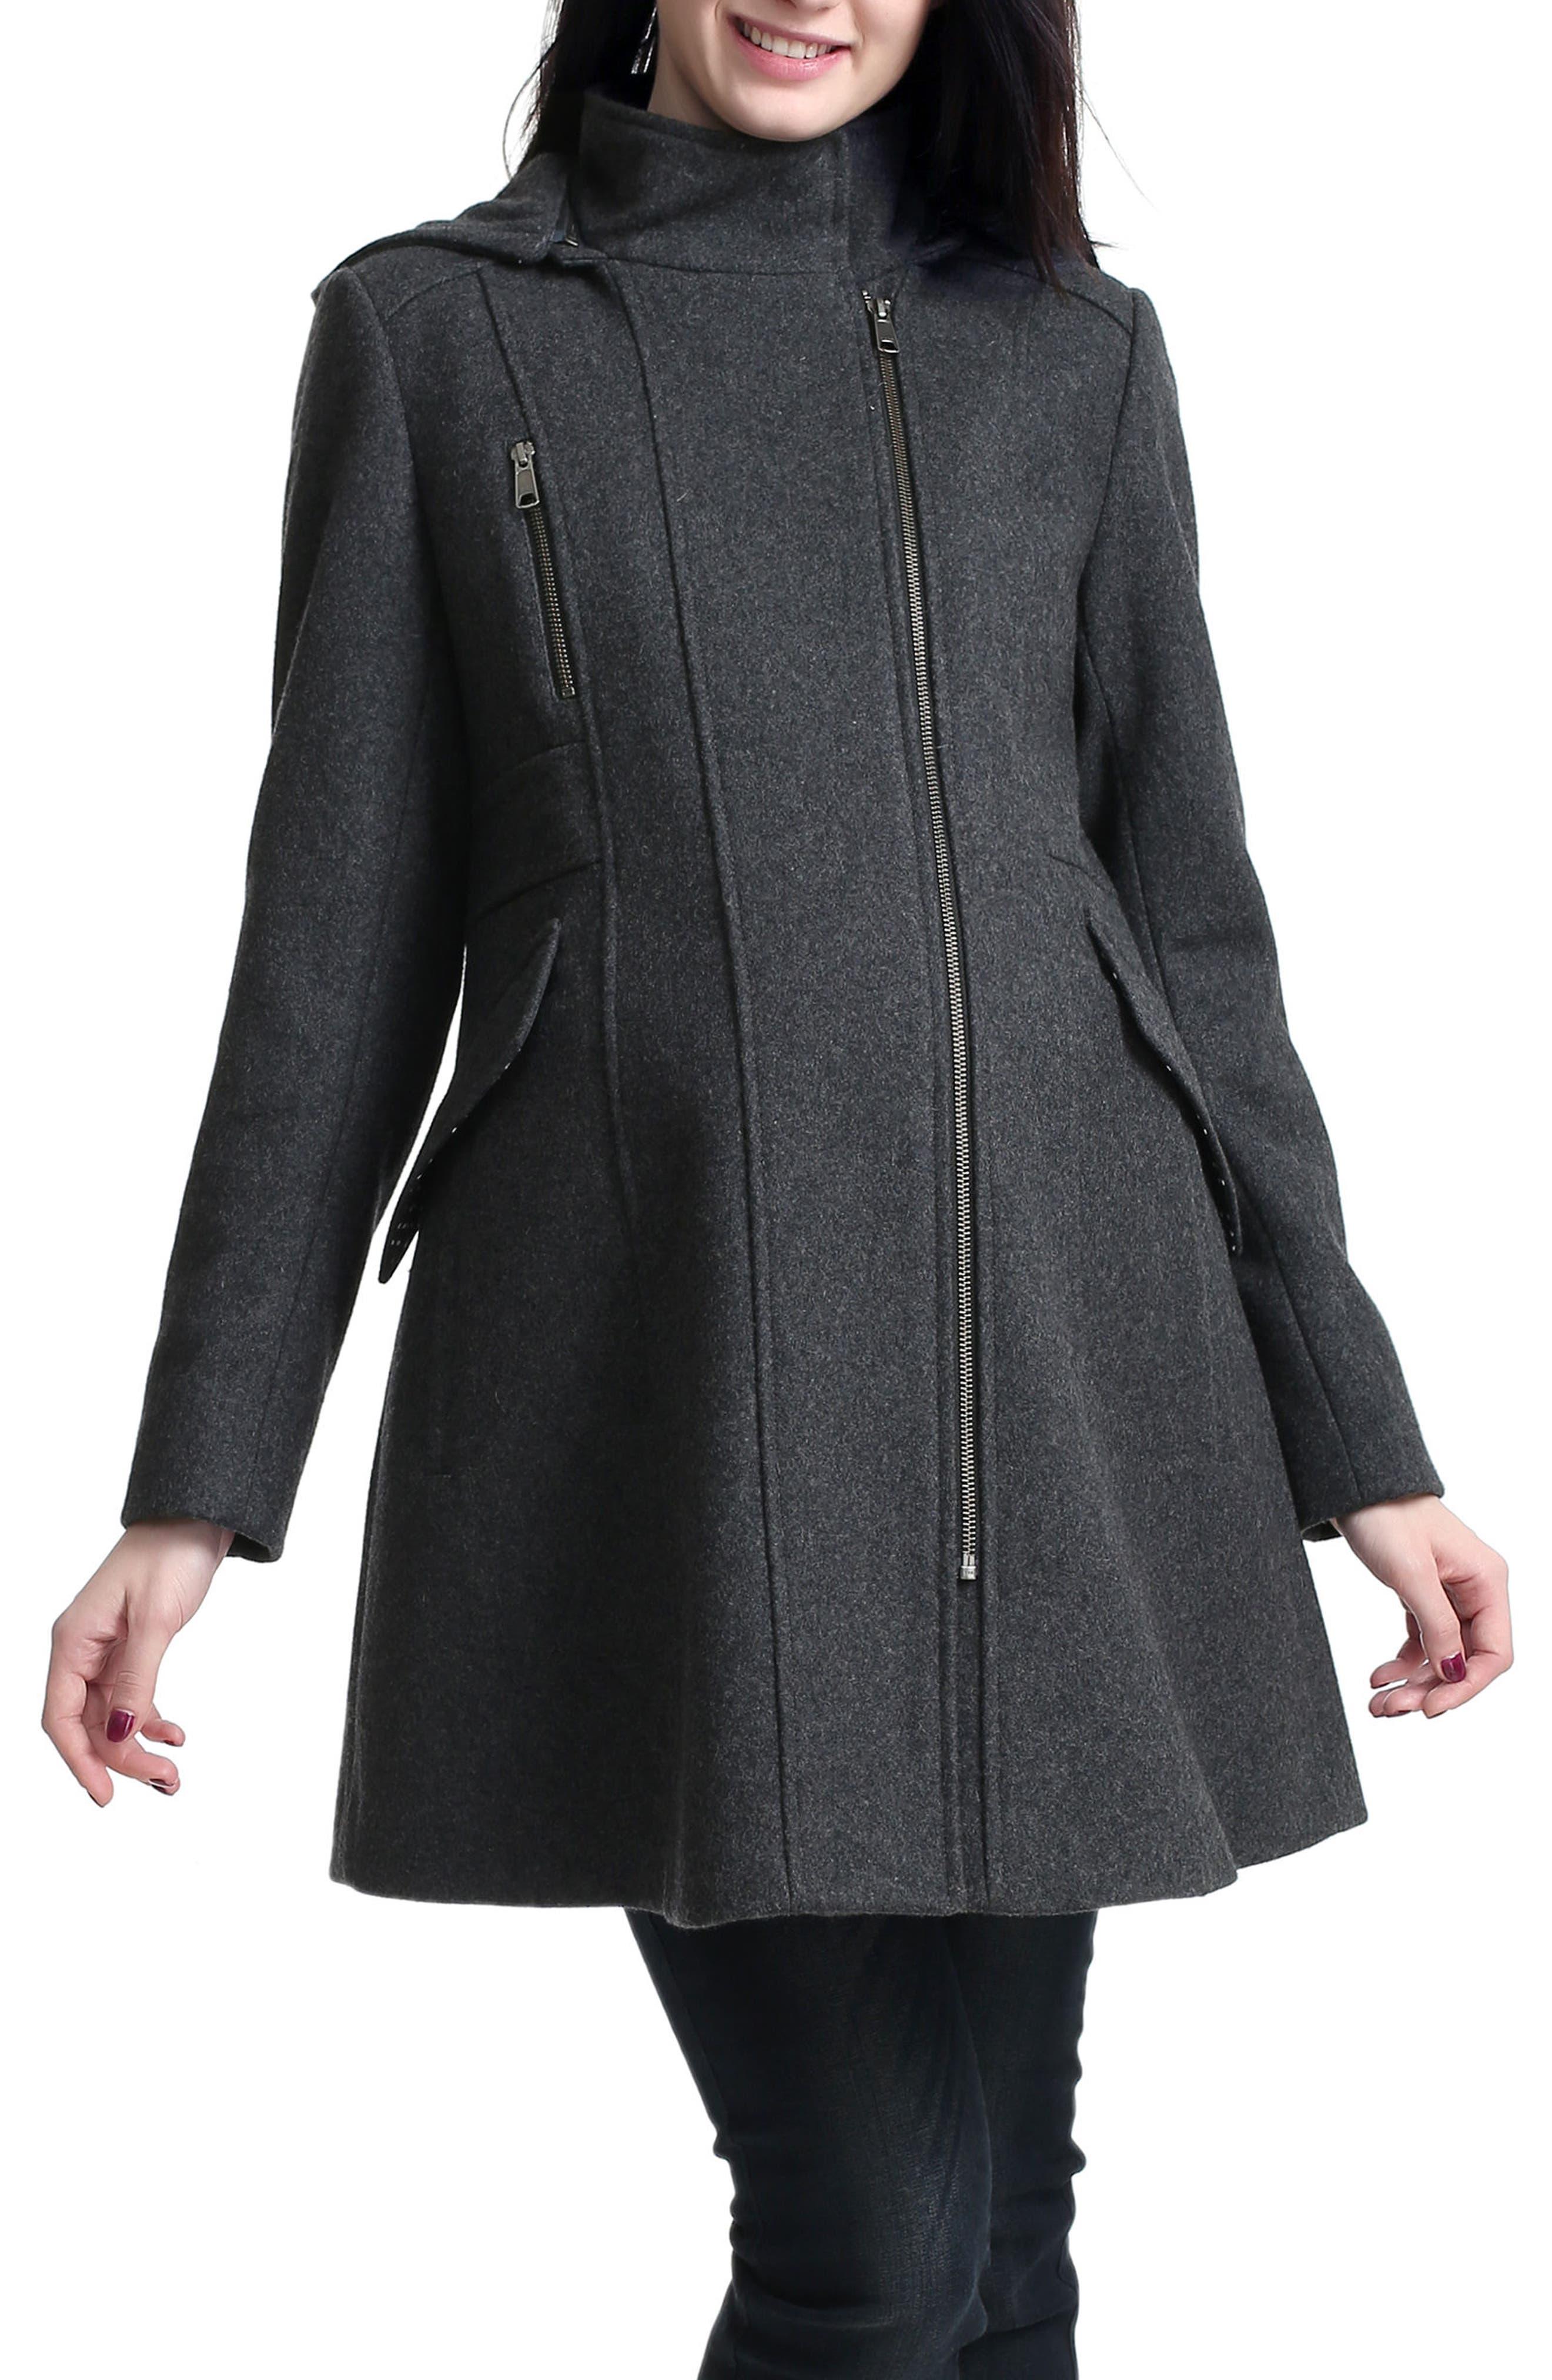 Main Image - Kimi and Kai Cordella Wool Blend Hooded Maternity Coat